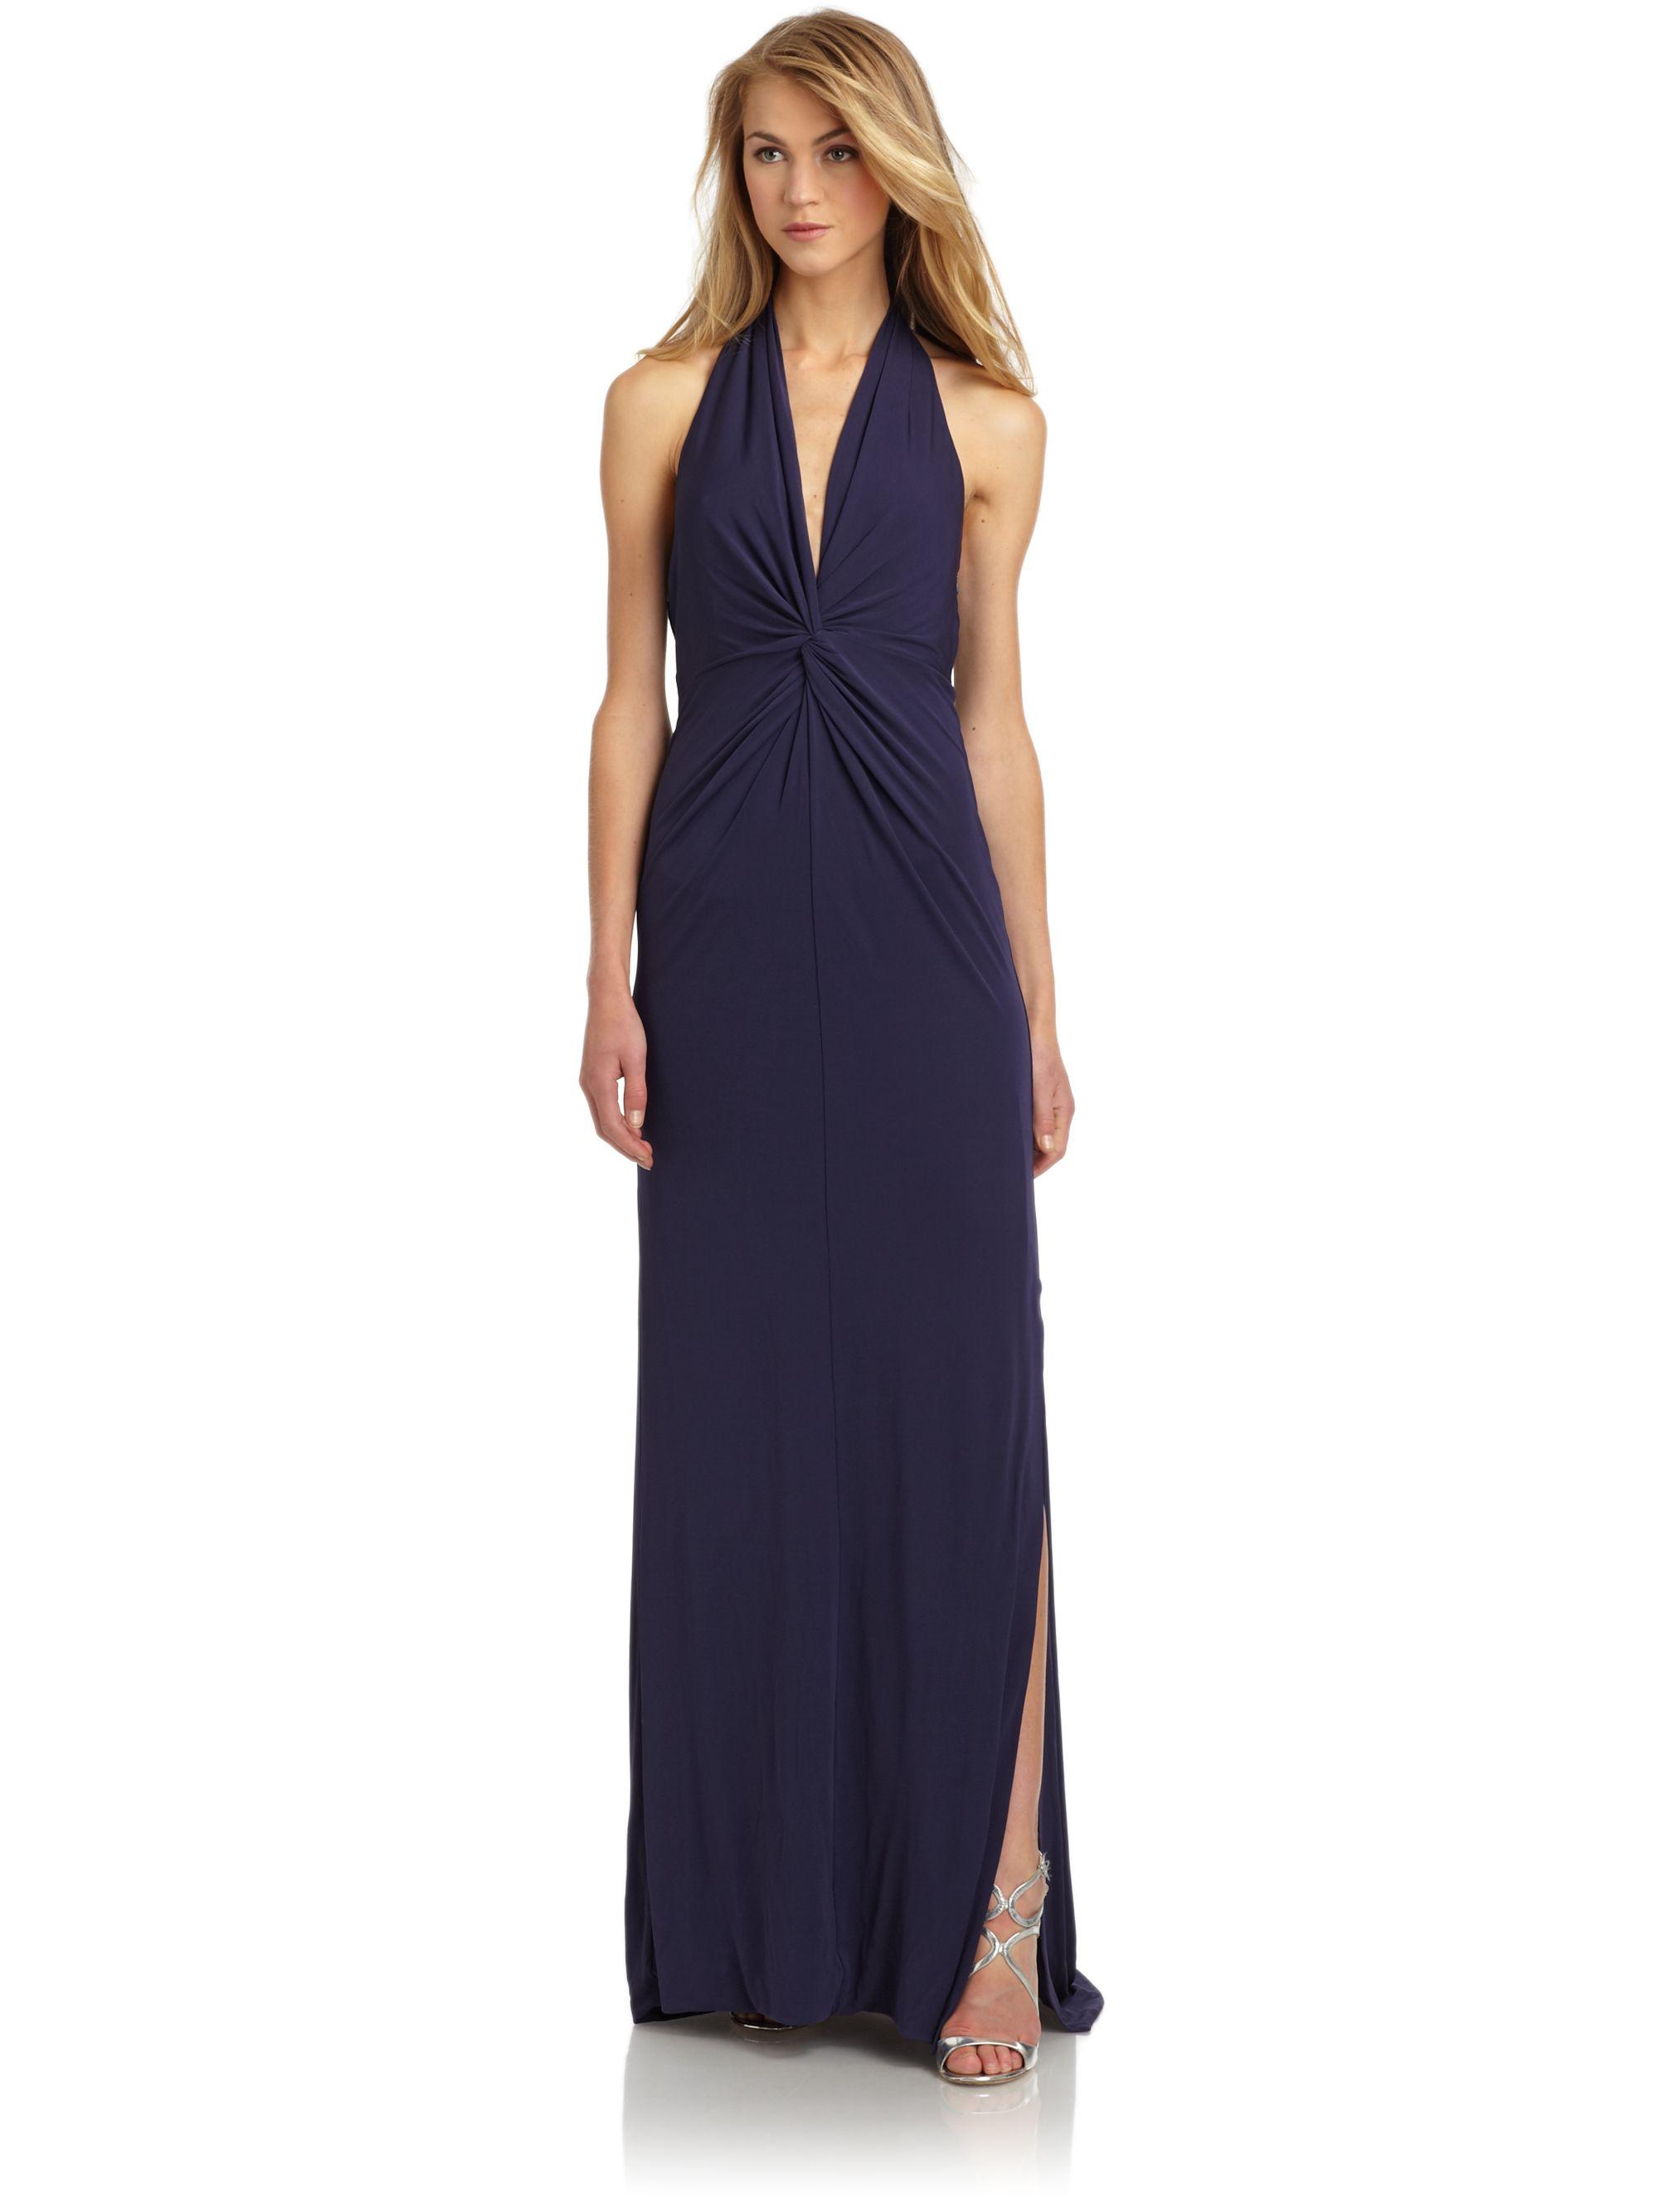 Halston Heritage Blue Dress  Cocktail Dresses 2016